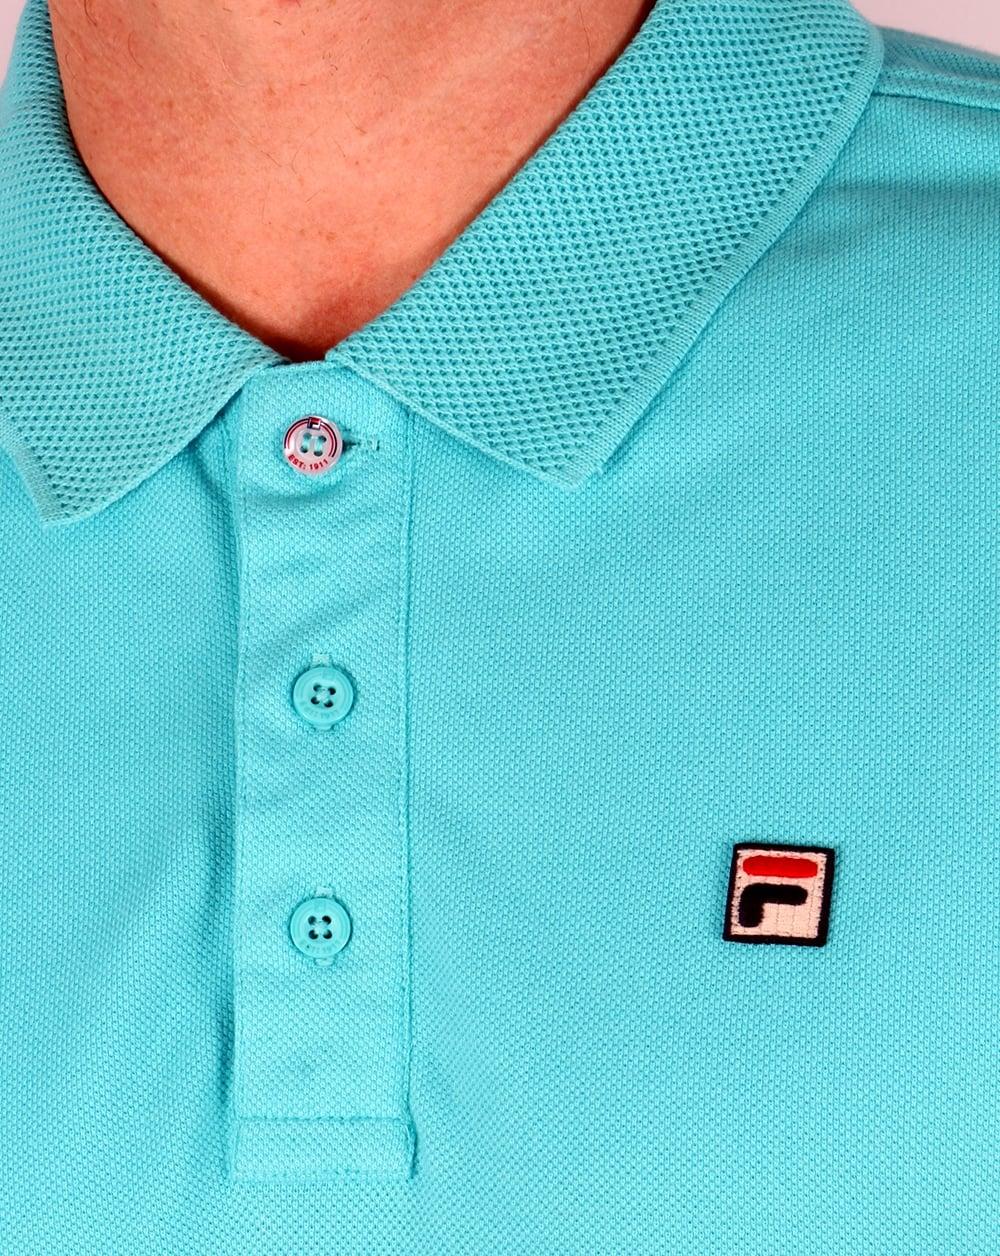 201bdc768 Fila Vintage Brizzi Polo Shirt Blue Radience, Men's, Top, Pique,Cotton